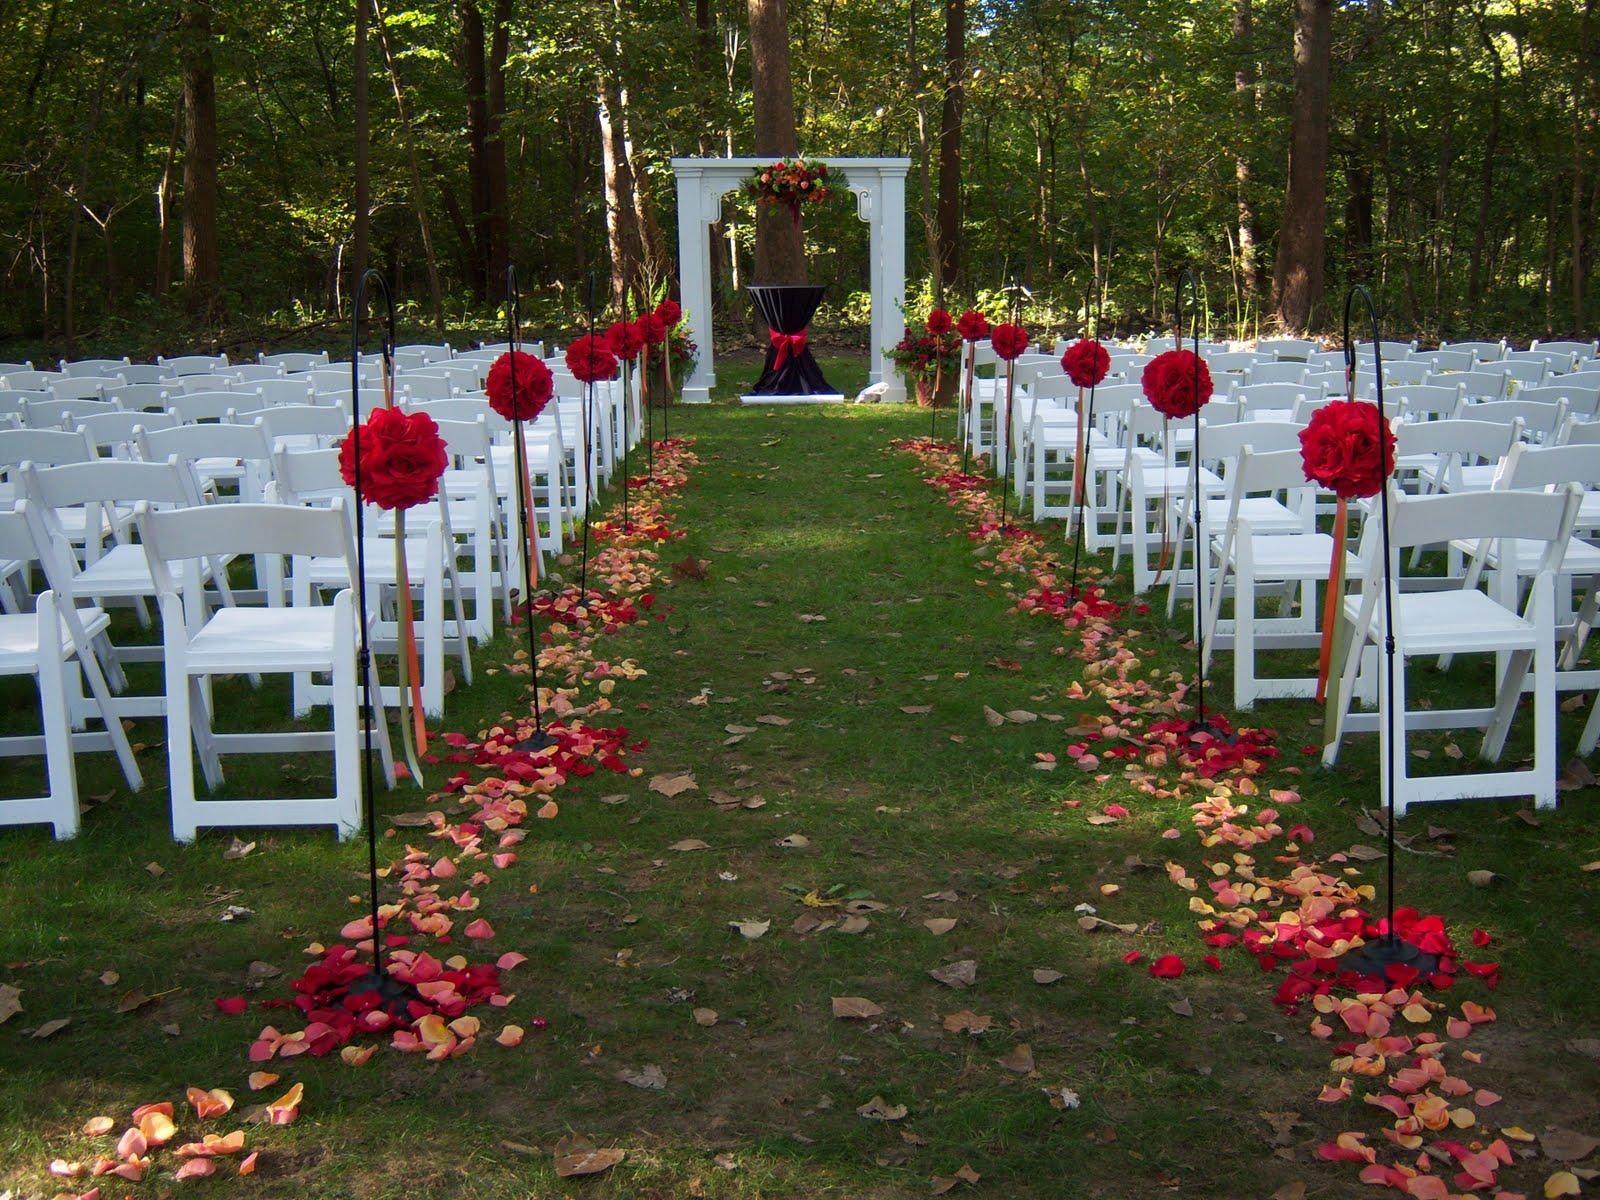 Lovely Weddings: Fall Outdoor Wedding | Fall Outdoor ...